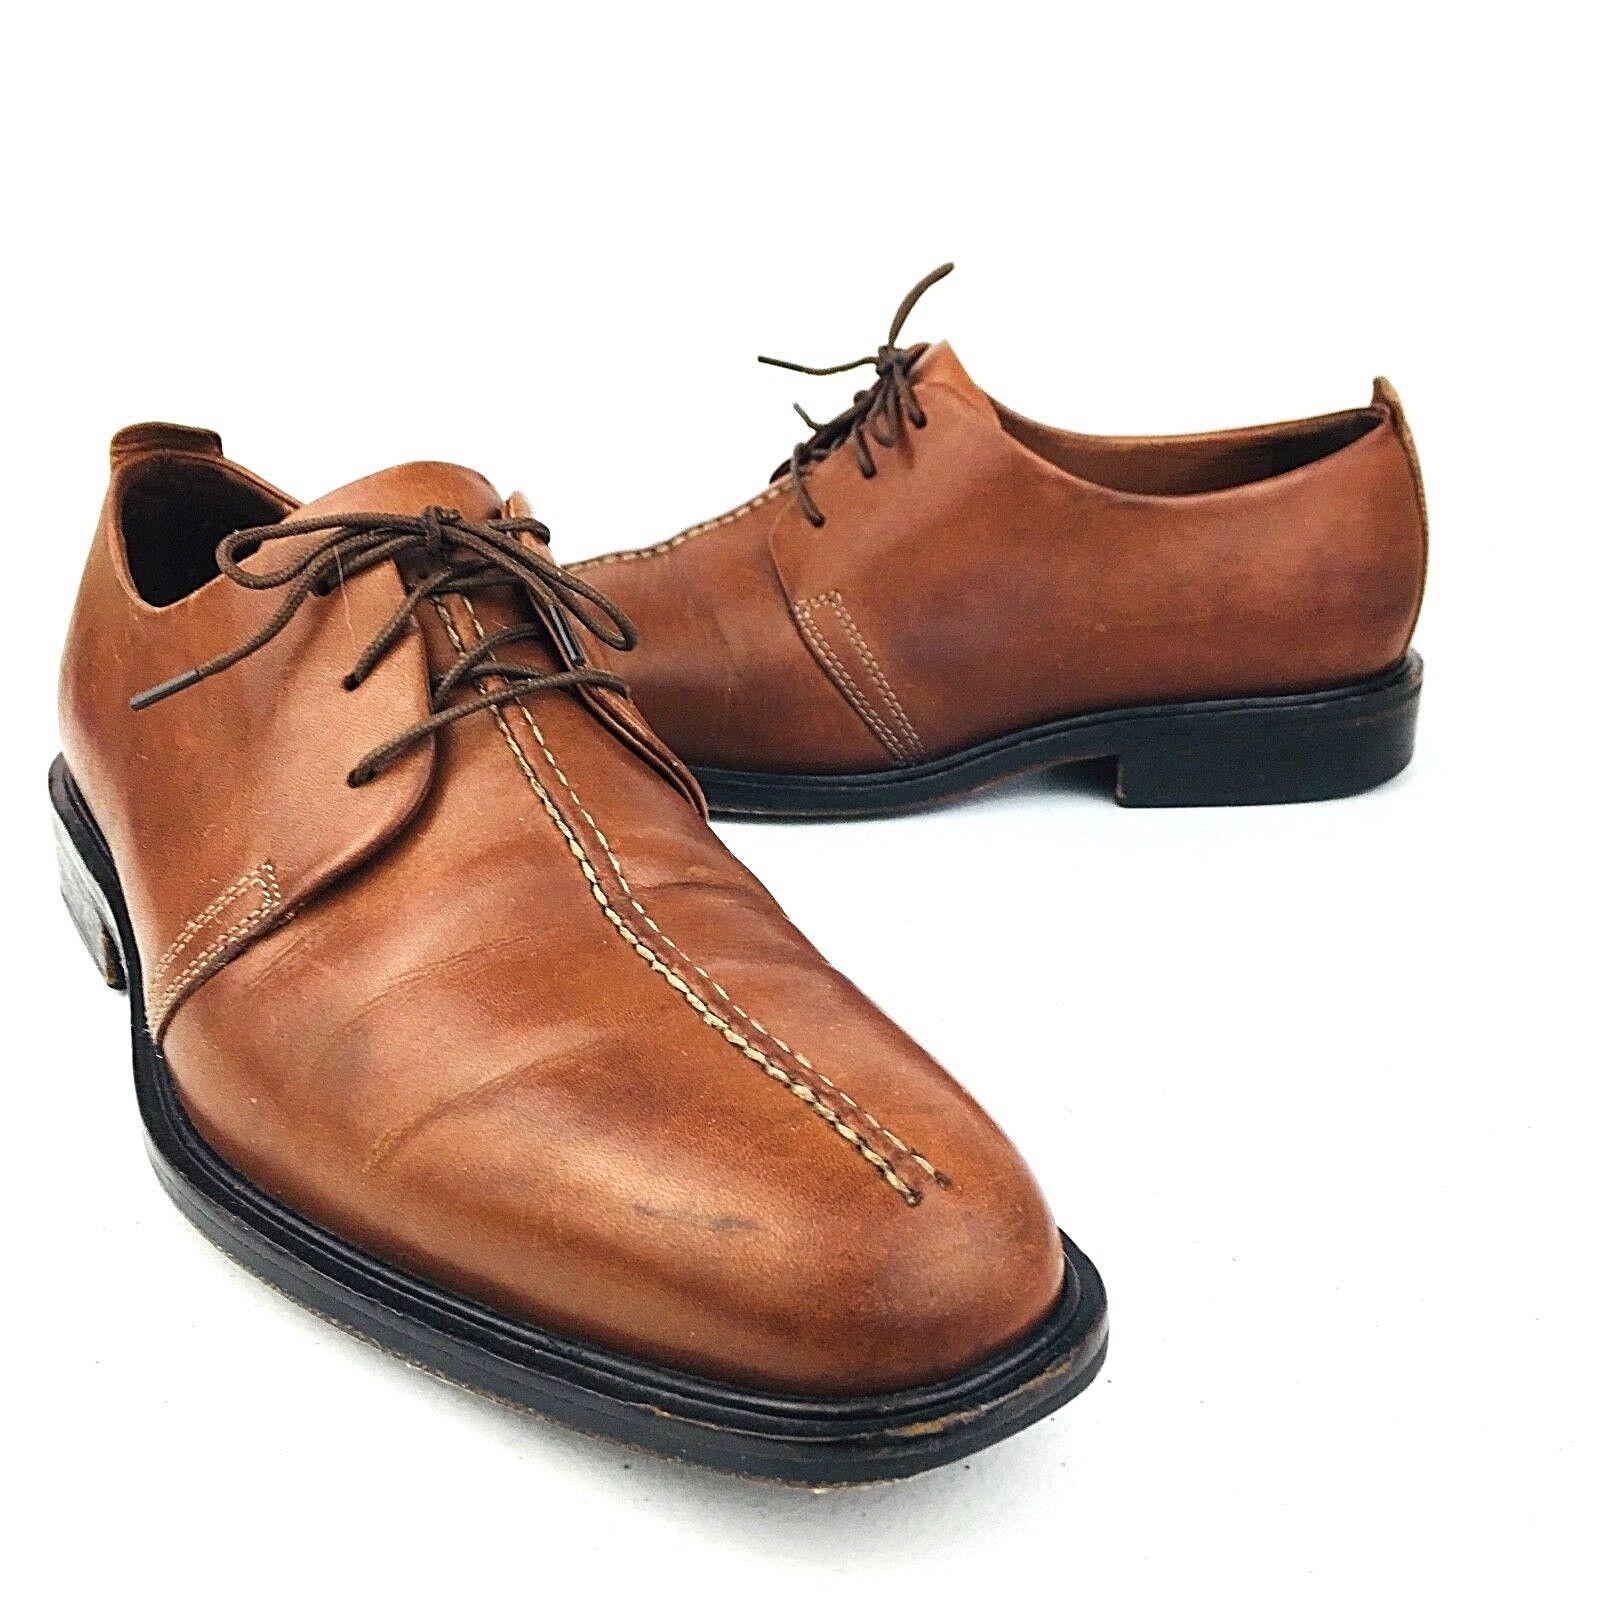 Cole Haan Uomo Air Lace Up Casual Shoes Brown 4817304 Santa Barbara Size 9